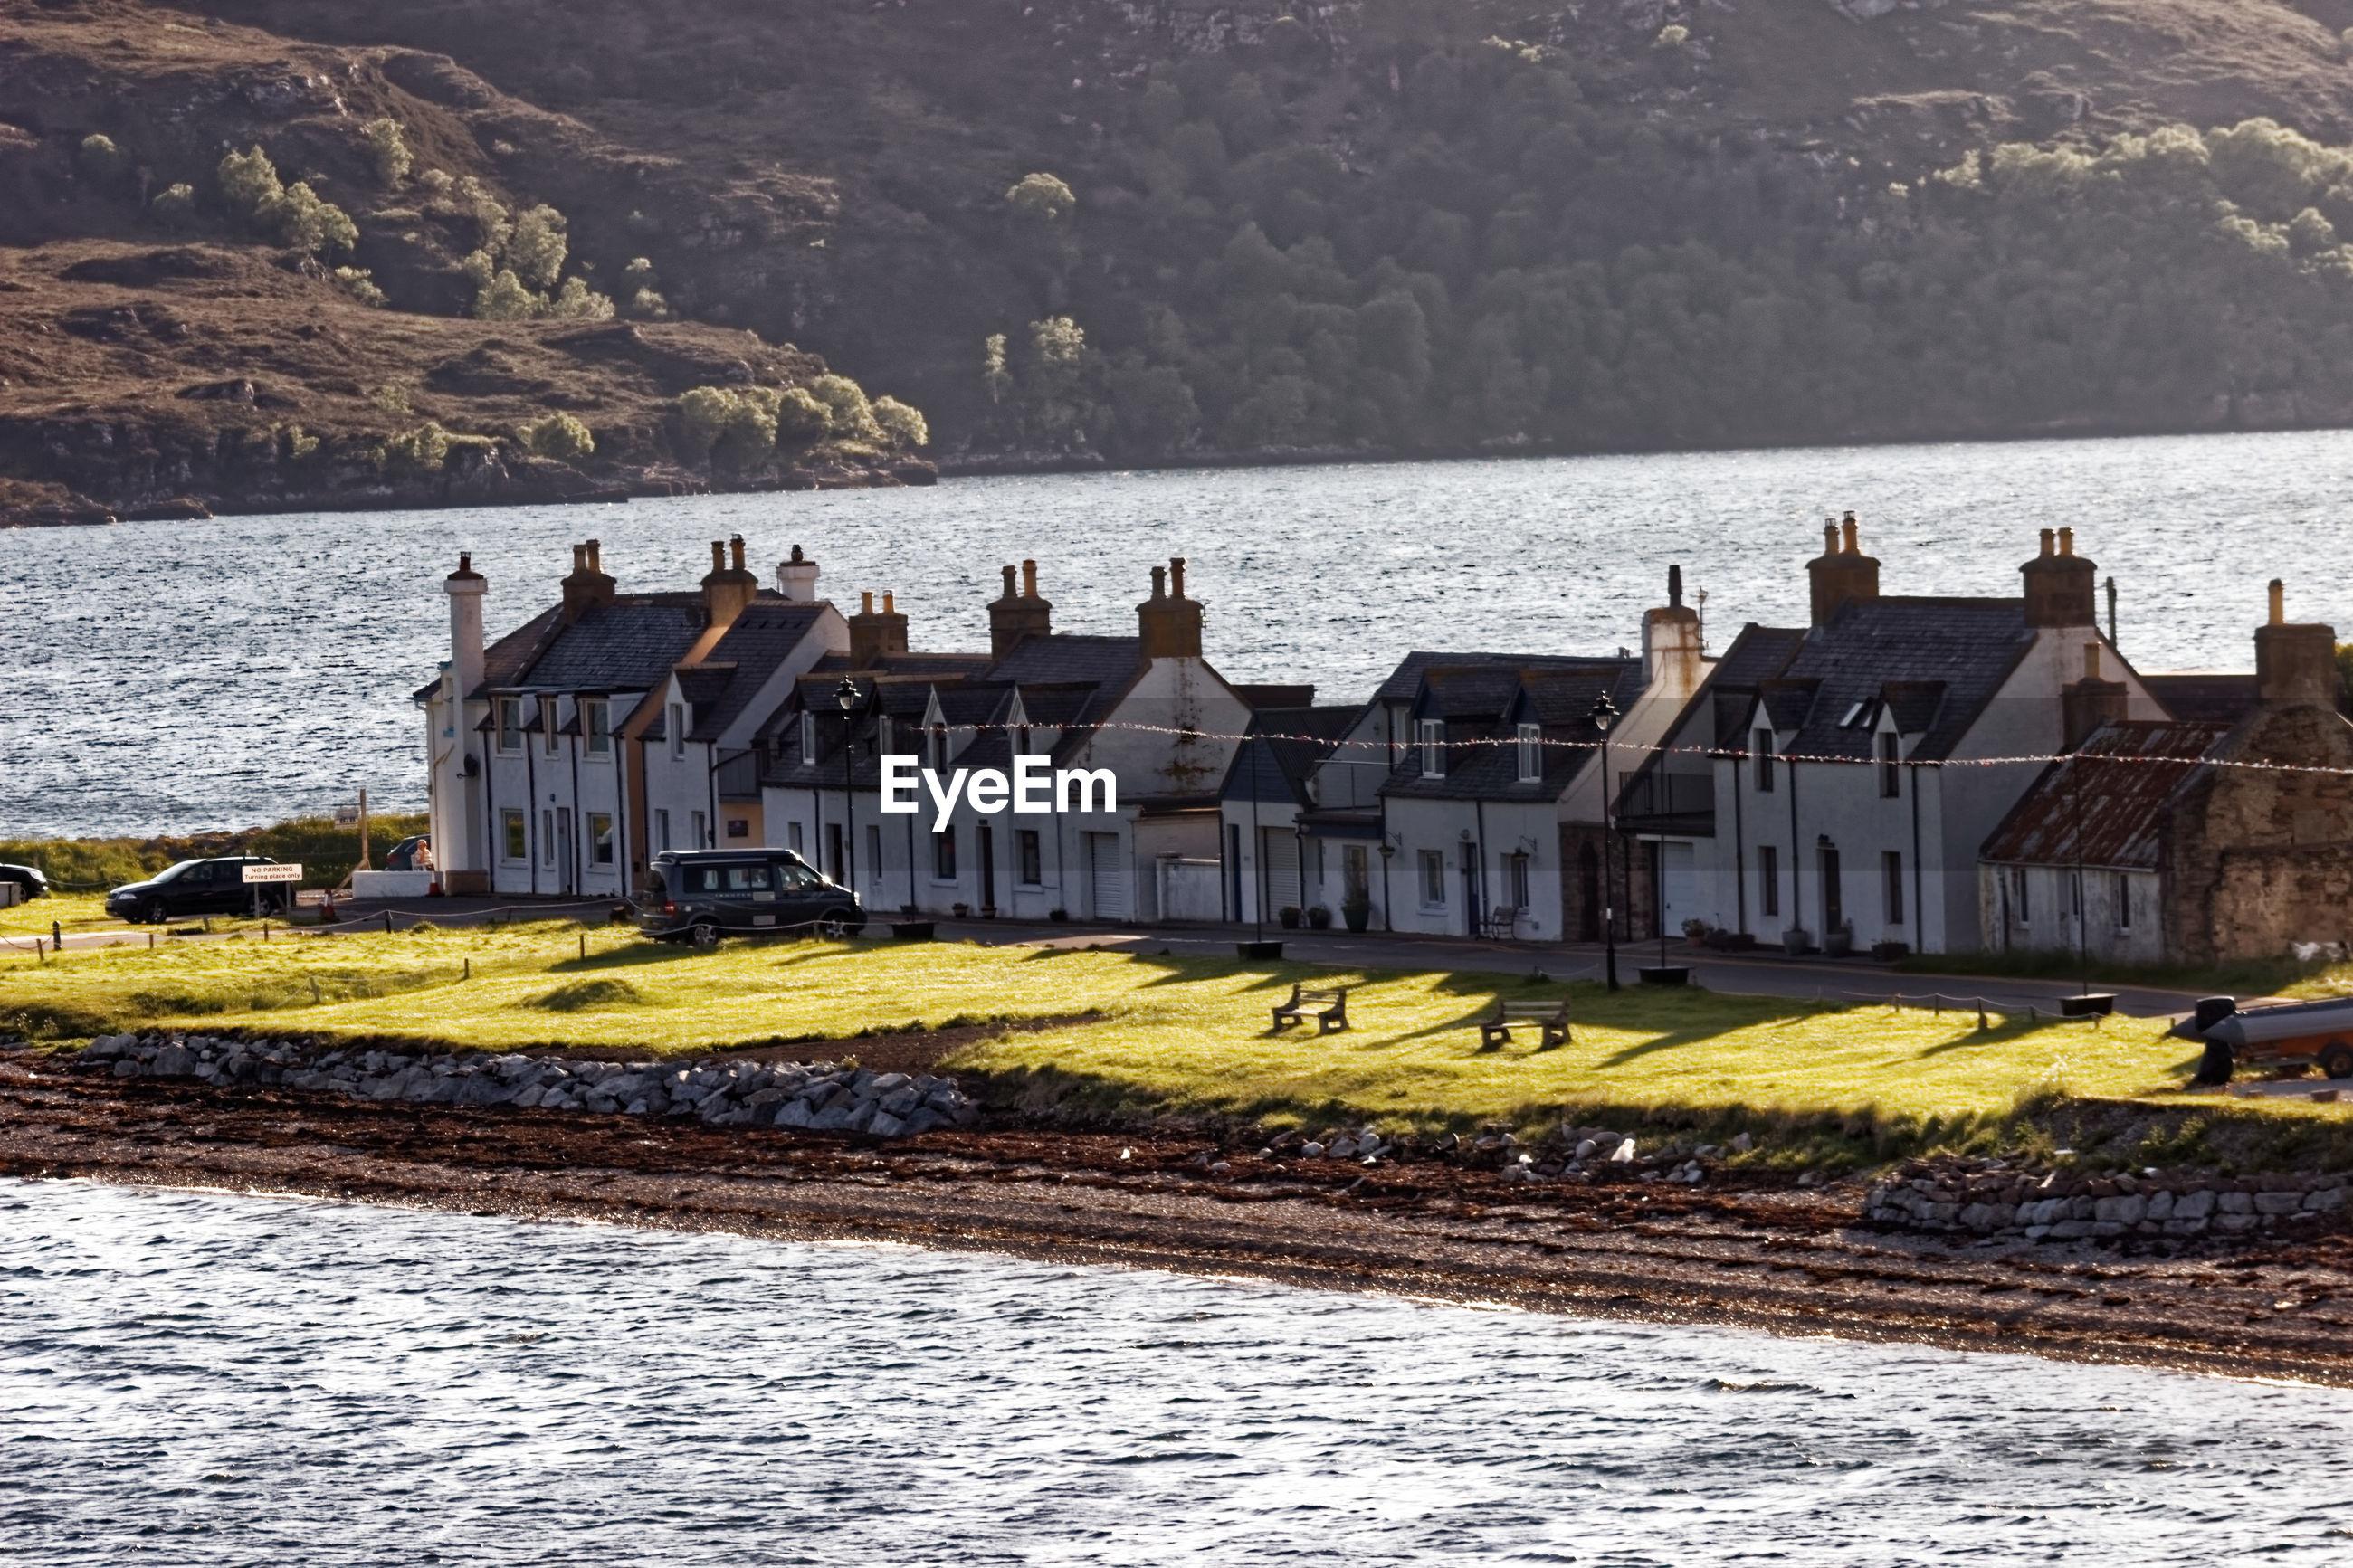 HOUSES ON BEACH BY SEA AGAINST BUILDINGS